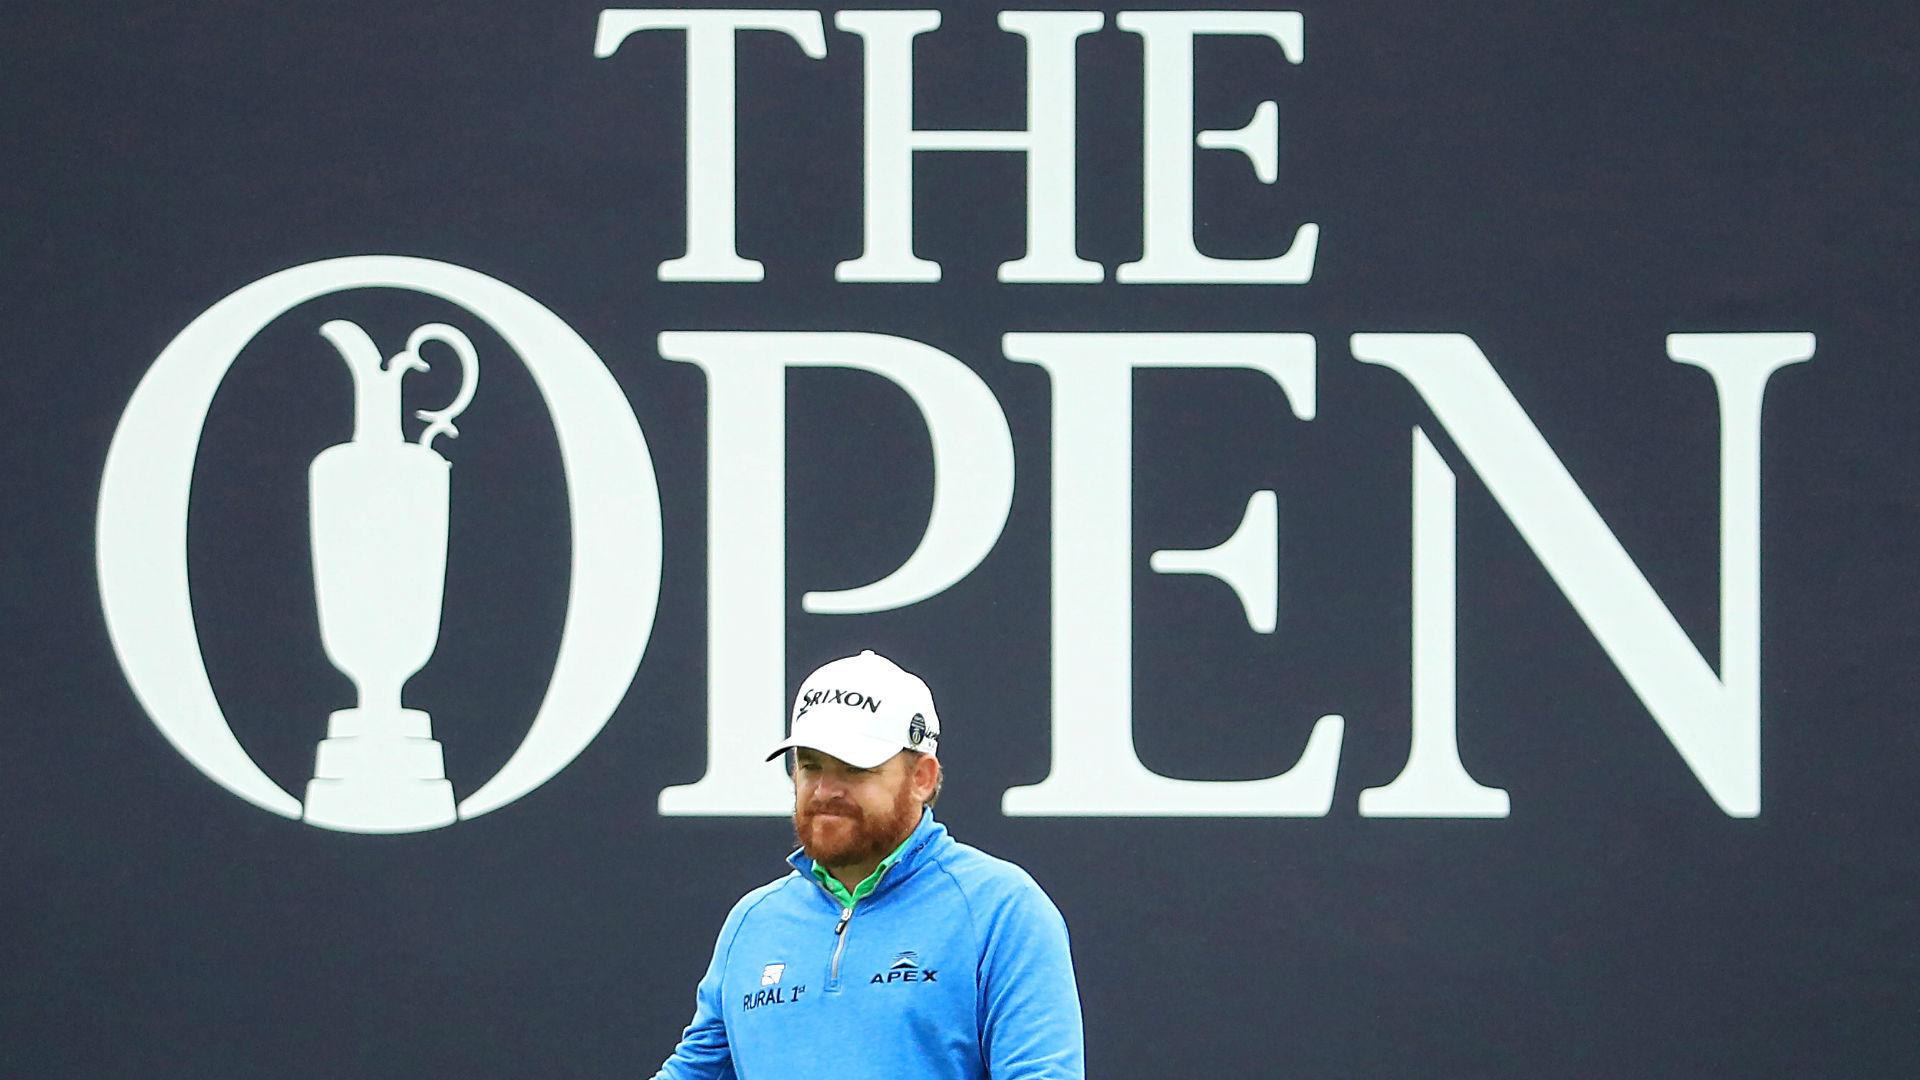 british open golf live scoreboard